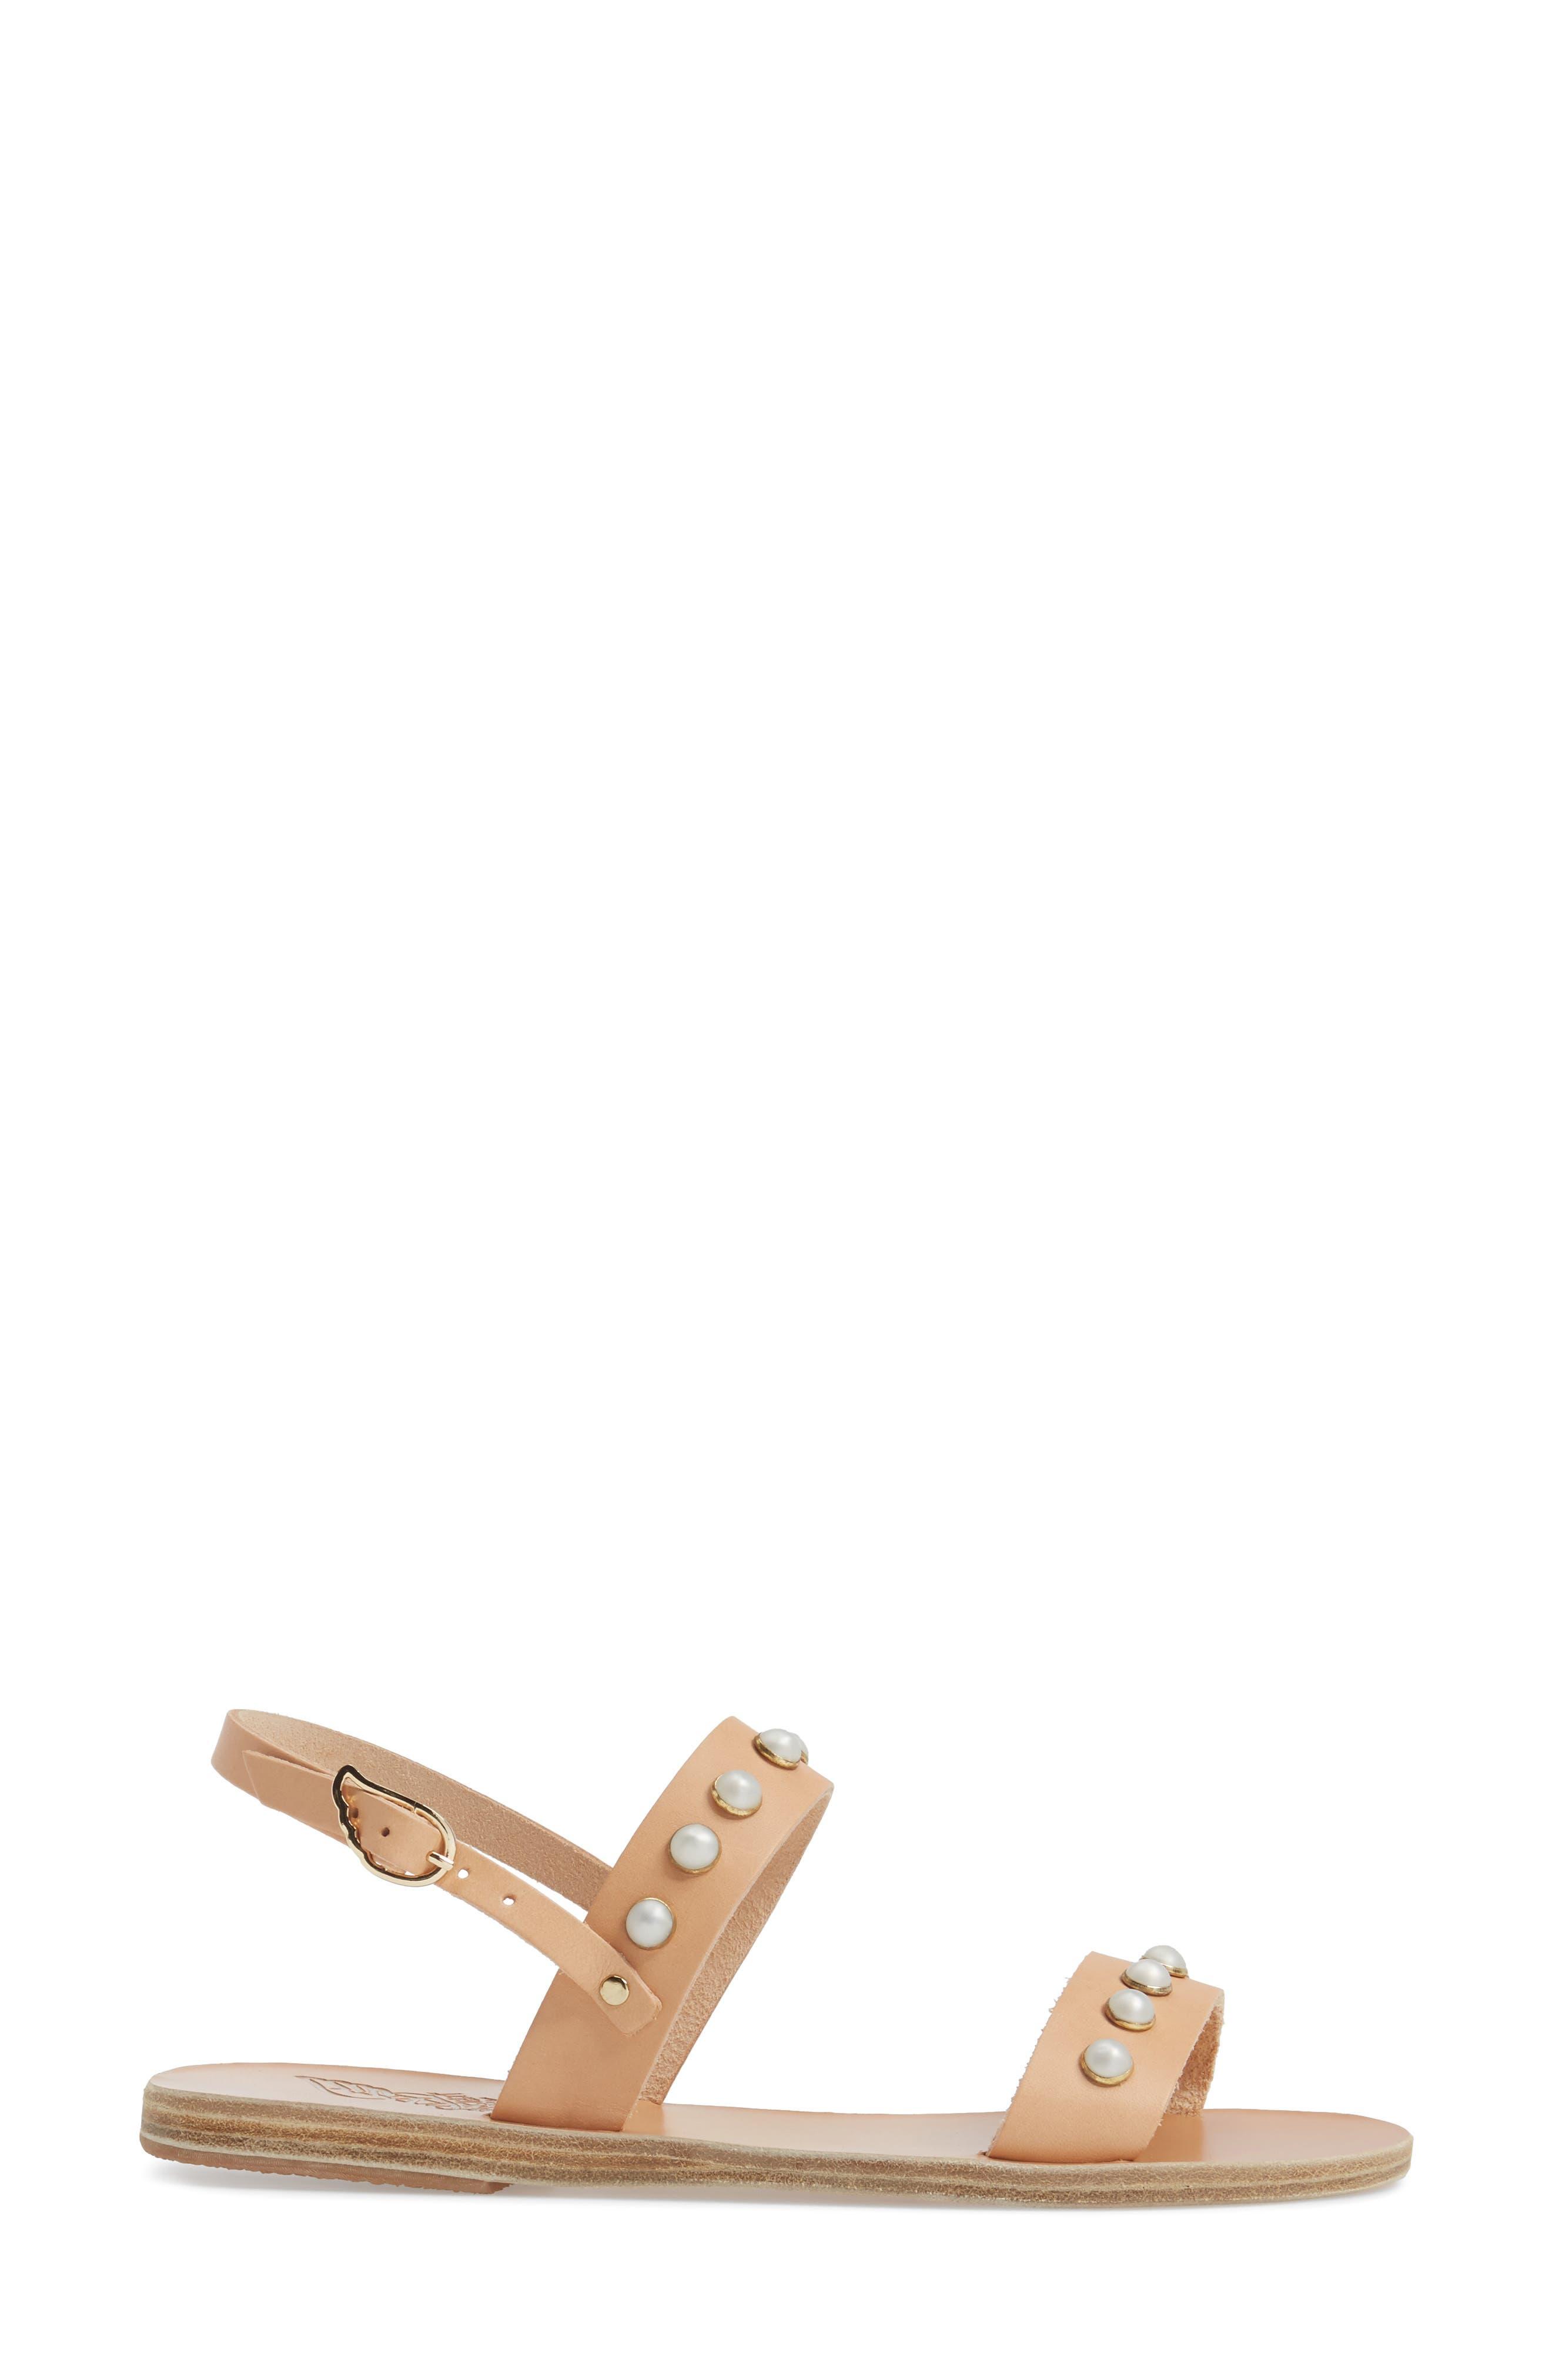 Clio Sandal,                             Alternate thumbnail 6, color,